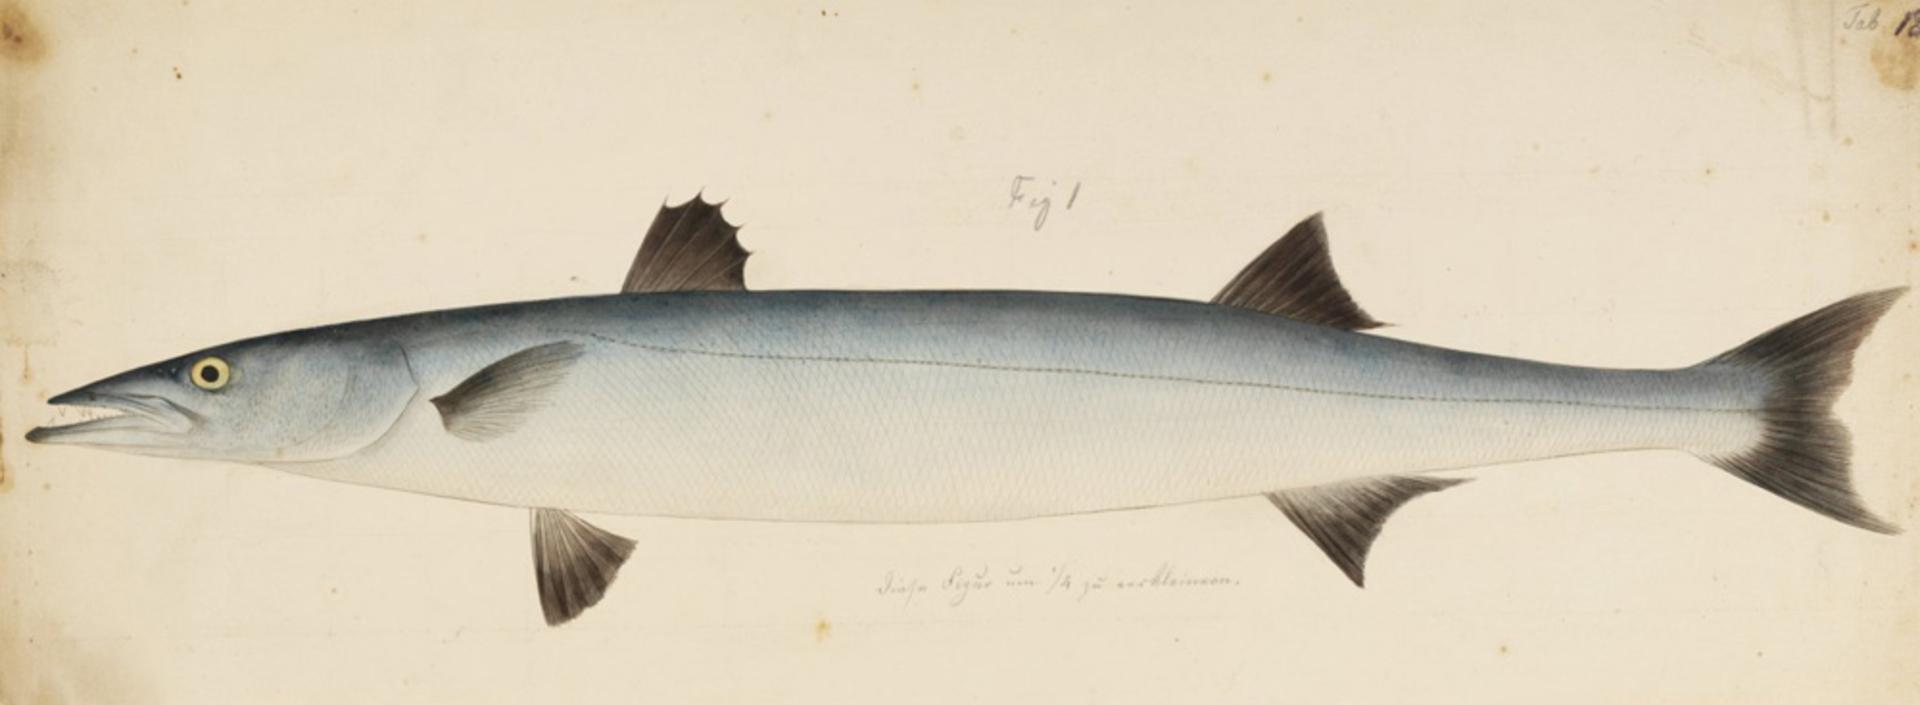 RMNH.ART.184   Sphyraena nigripinnis